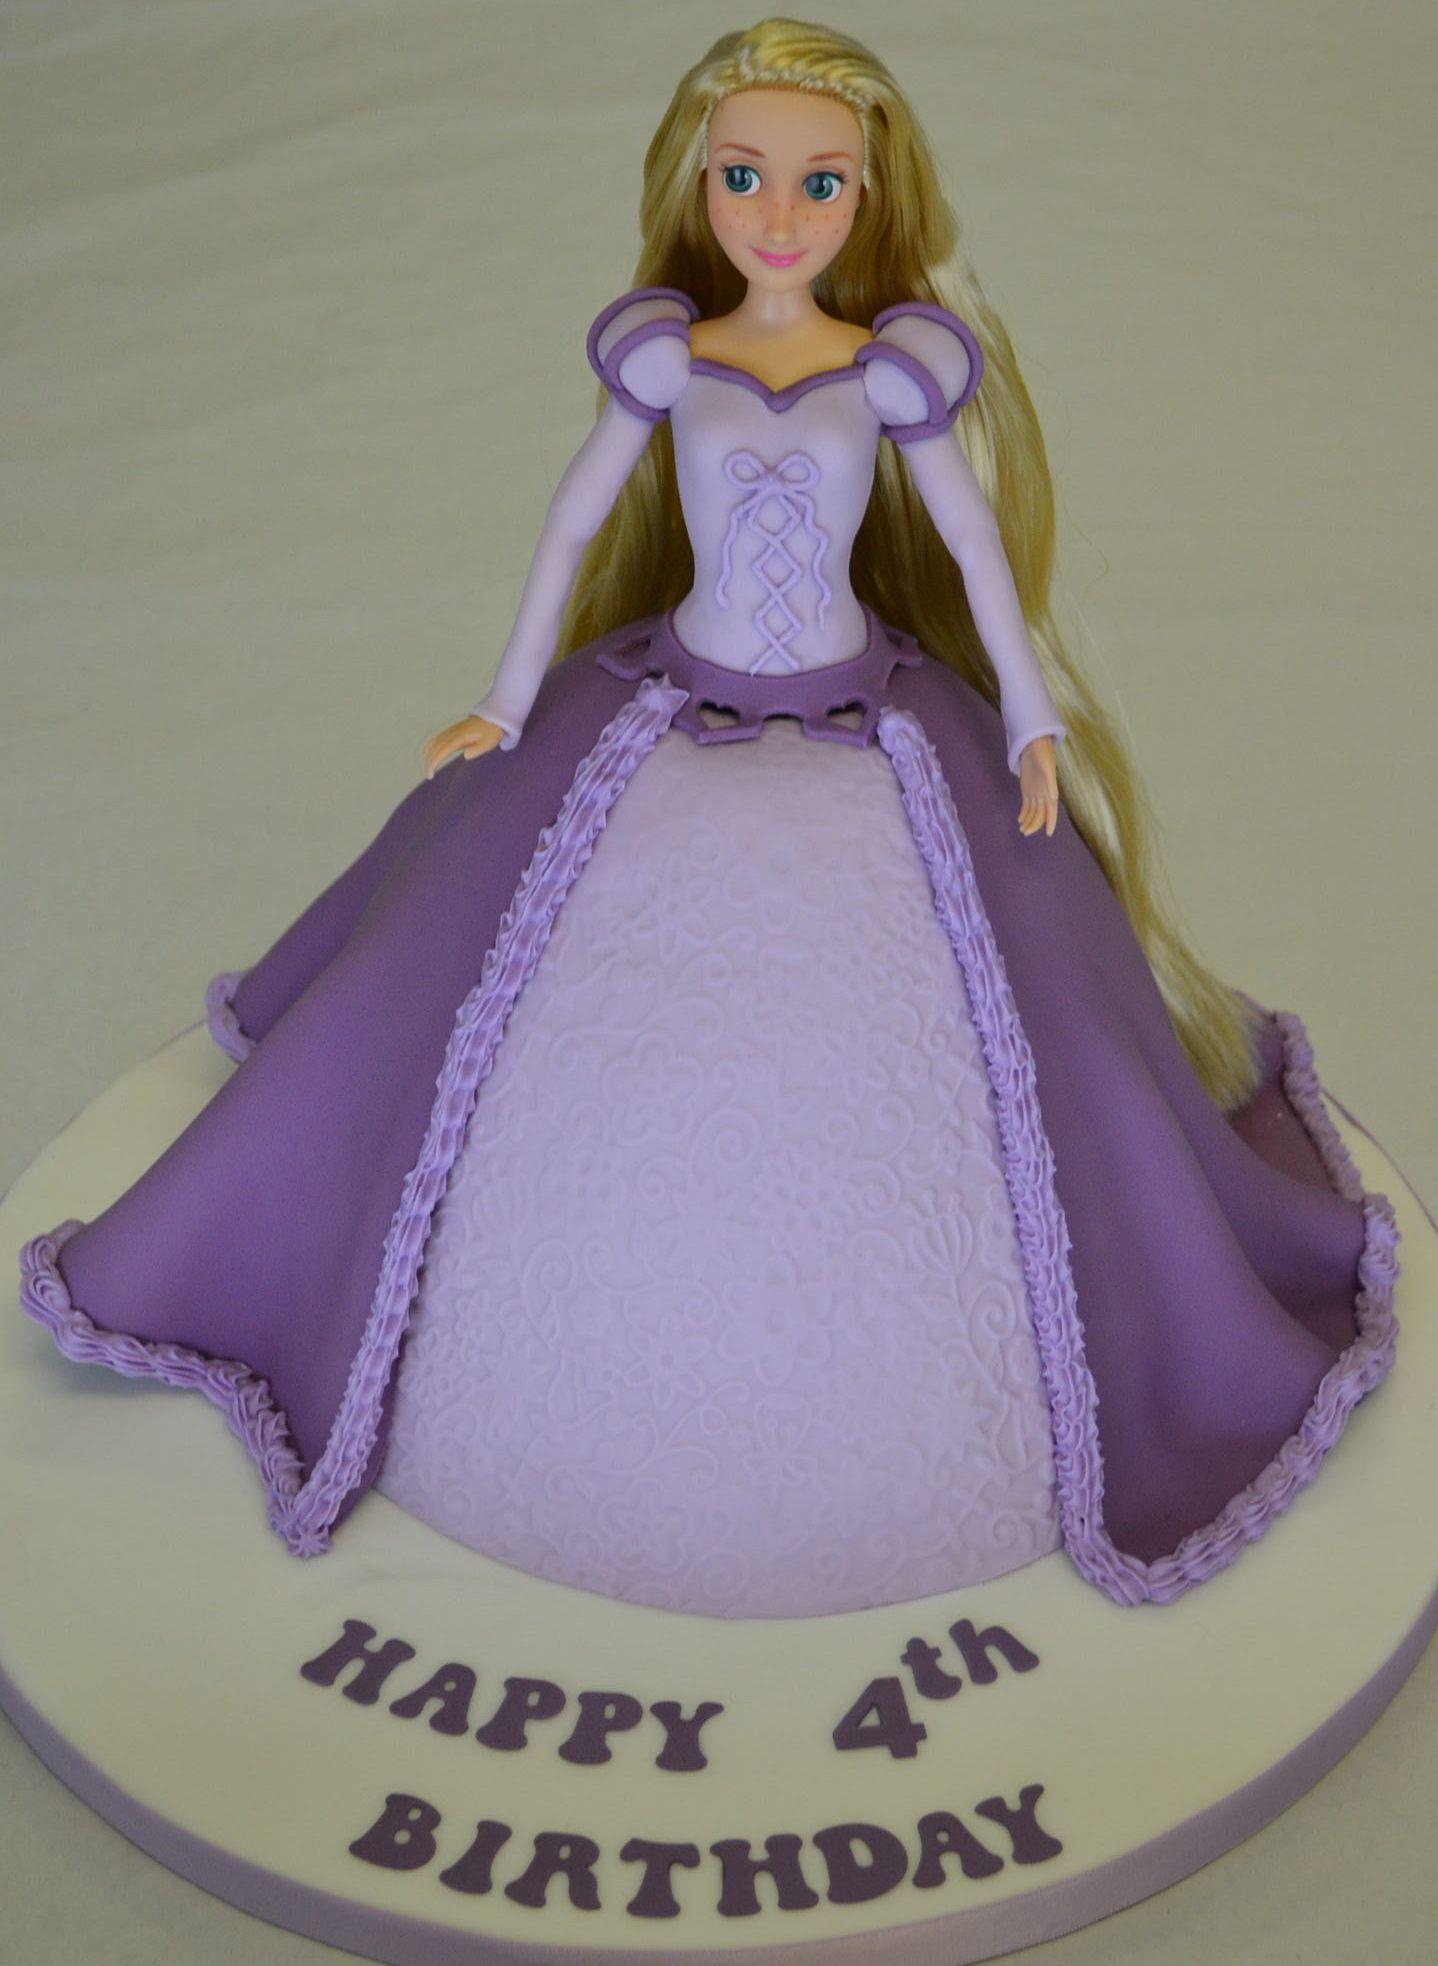 Rapunzel Doll Cake Kids Birthdays Pinterest Rapunzel Dolls - Birthday cake doll princess